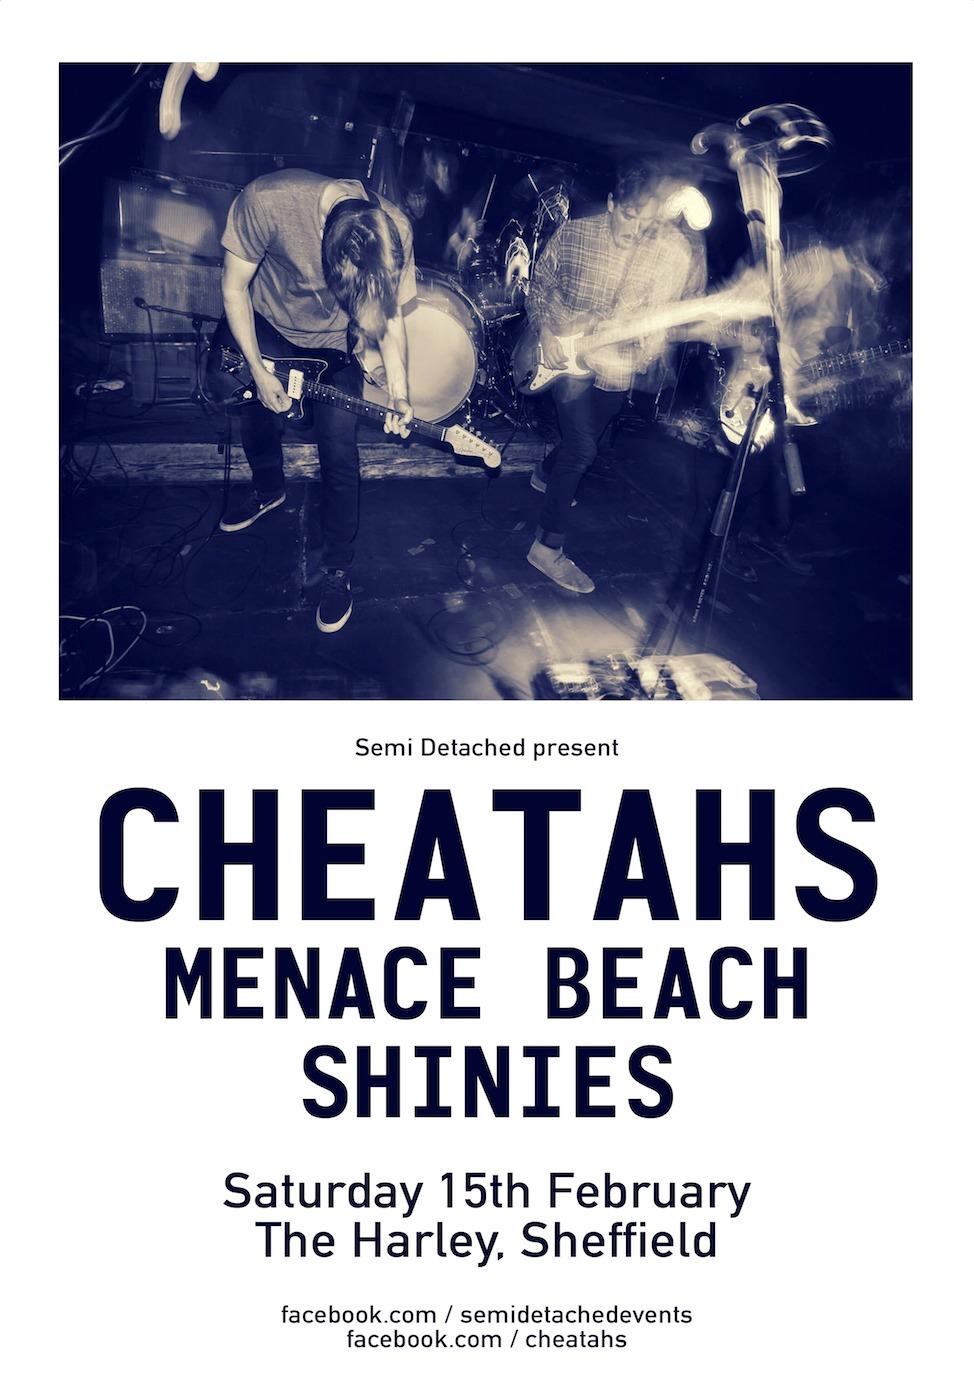 CHEATAHS + Menace Beach + Shinies More info available here. http://fb.com/semidetachedevents